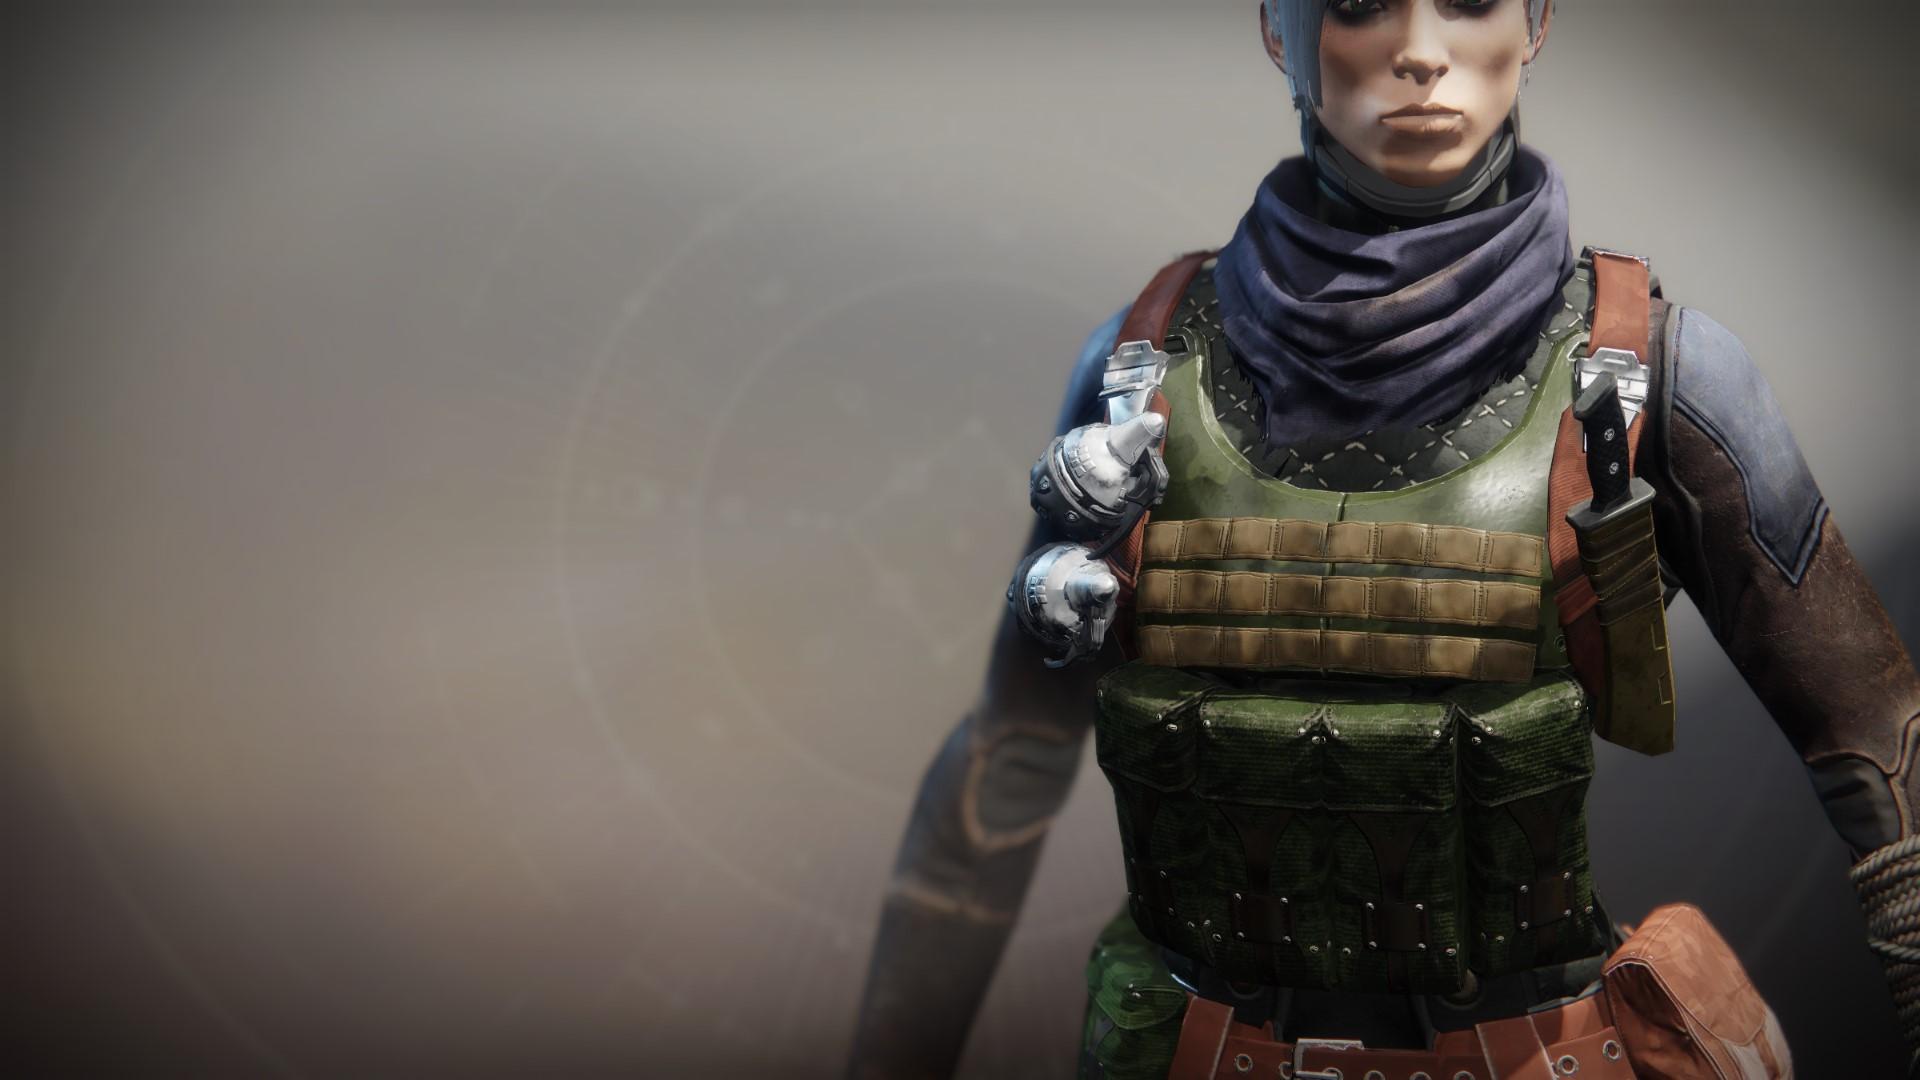 An in-game render of the Wildwood Vest.